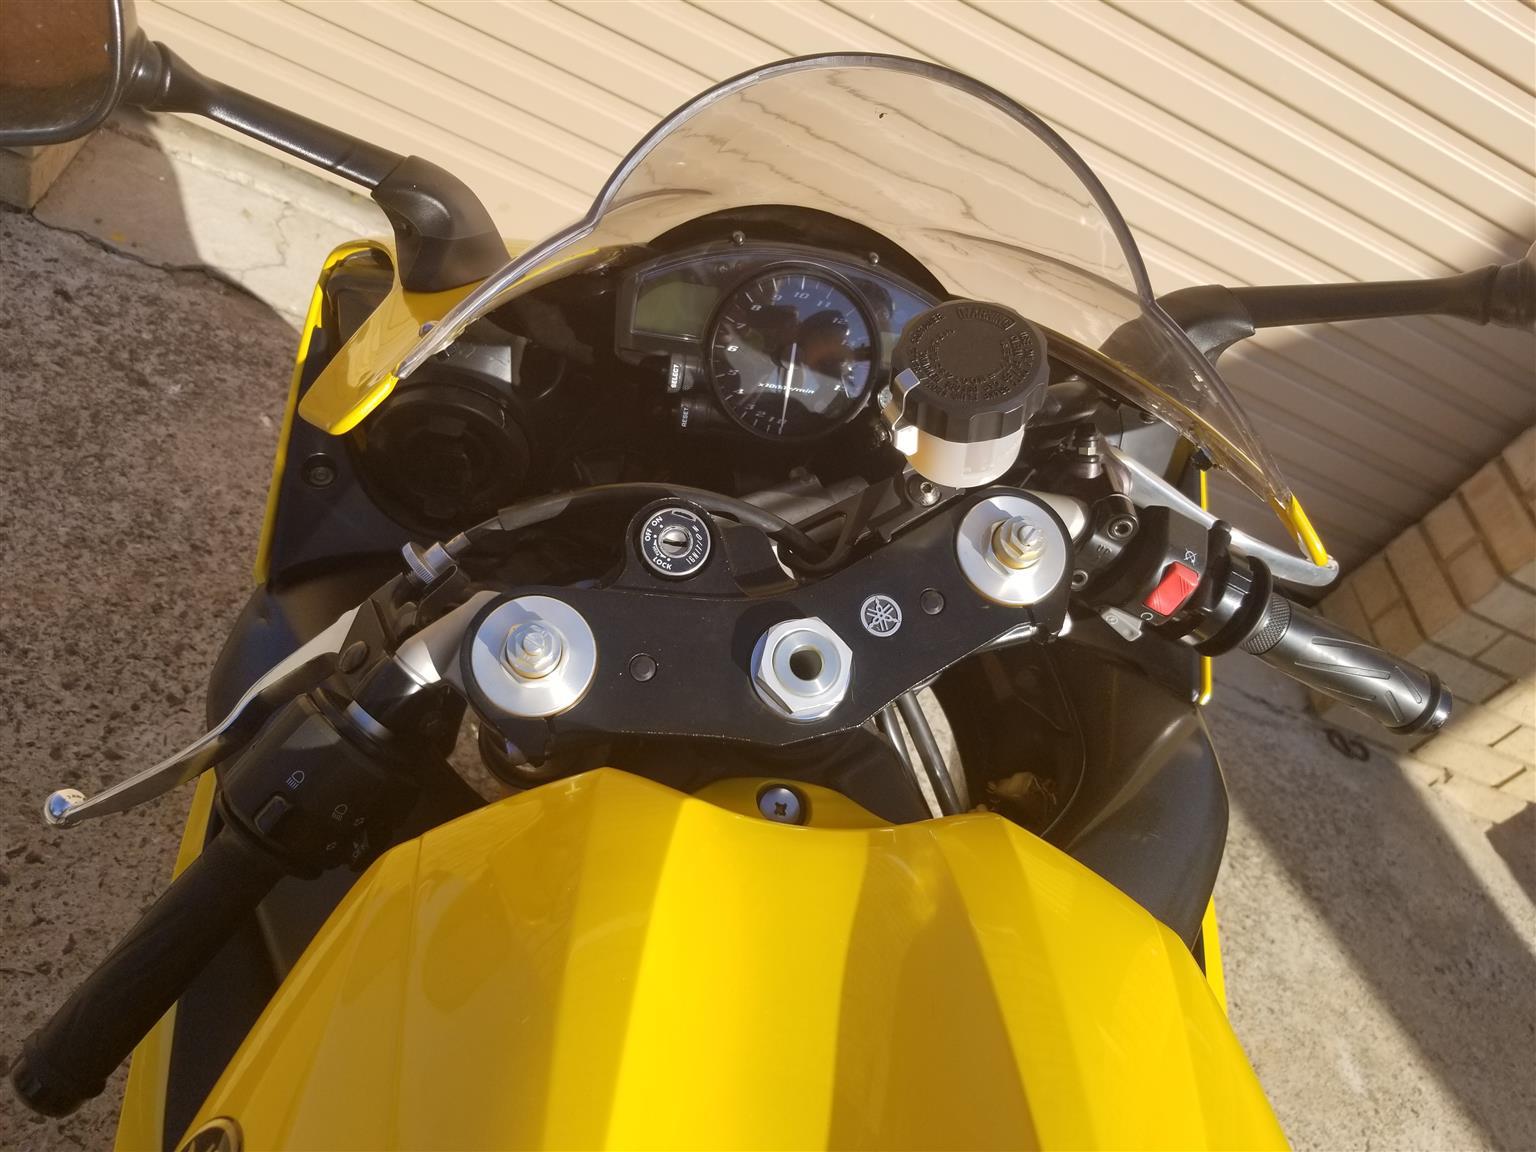 2009 Yamaha YZF R1